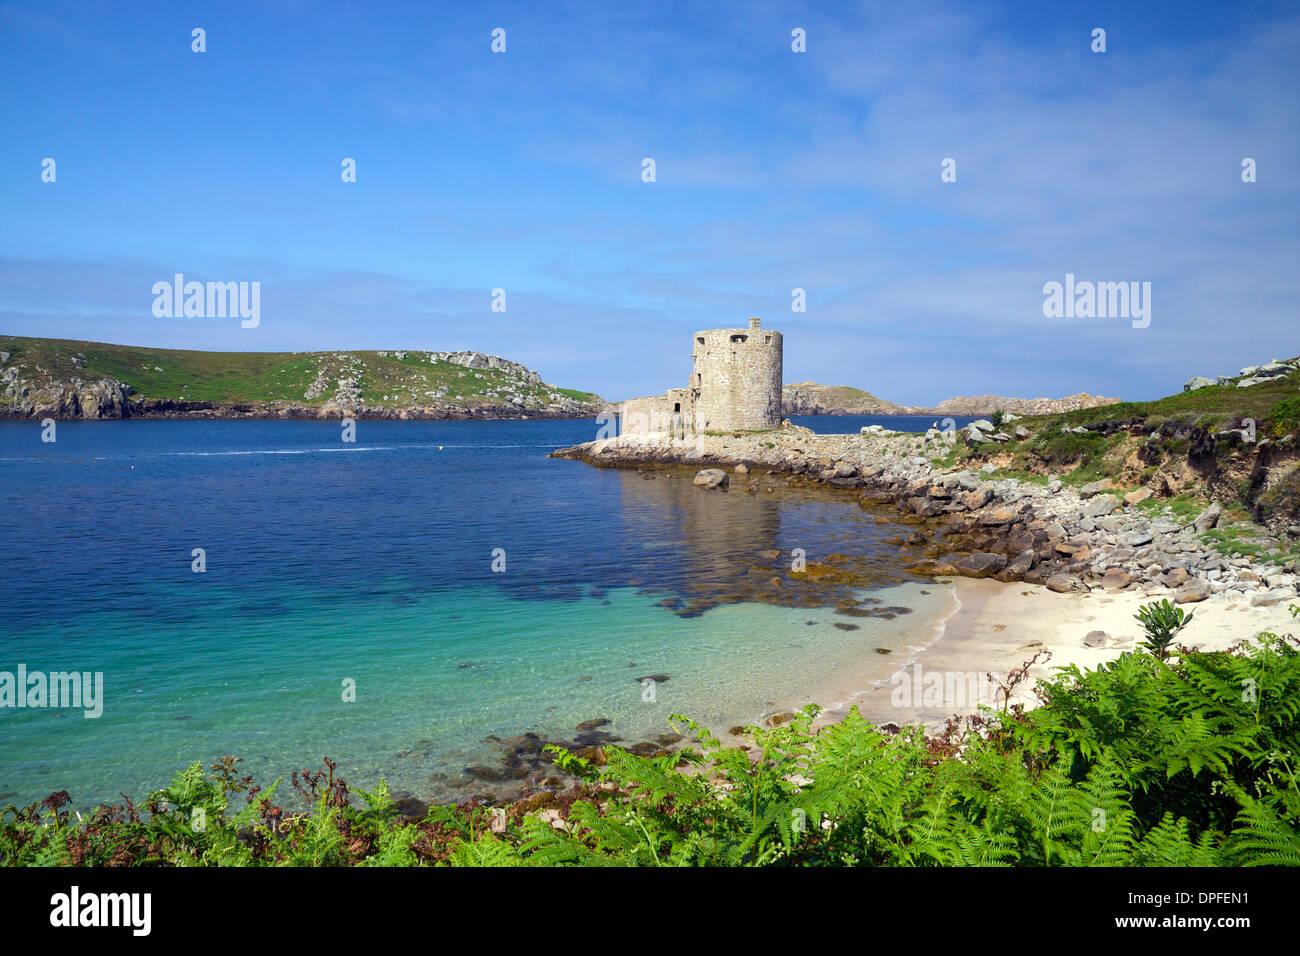 Cromwell's Castle in summer sunshine, Isle of Tresco, Isles of Scilly, United Kingdom, Europe - Stock Image